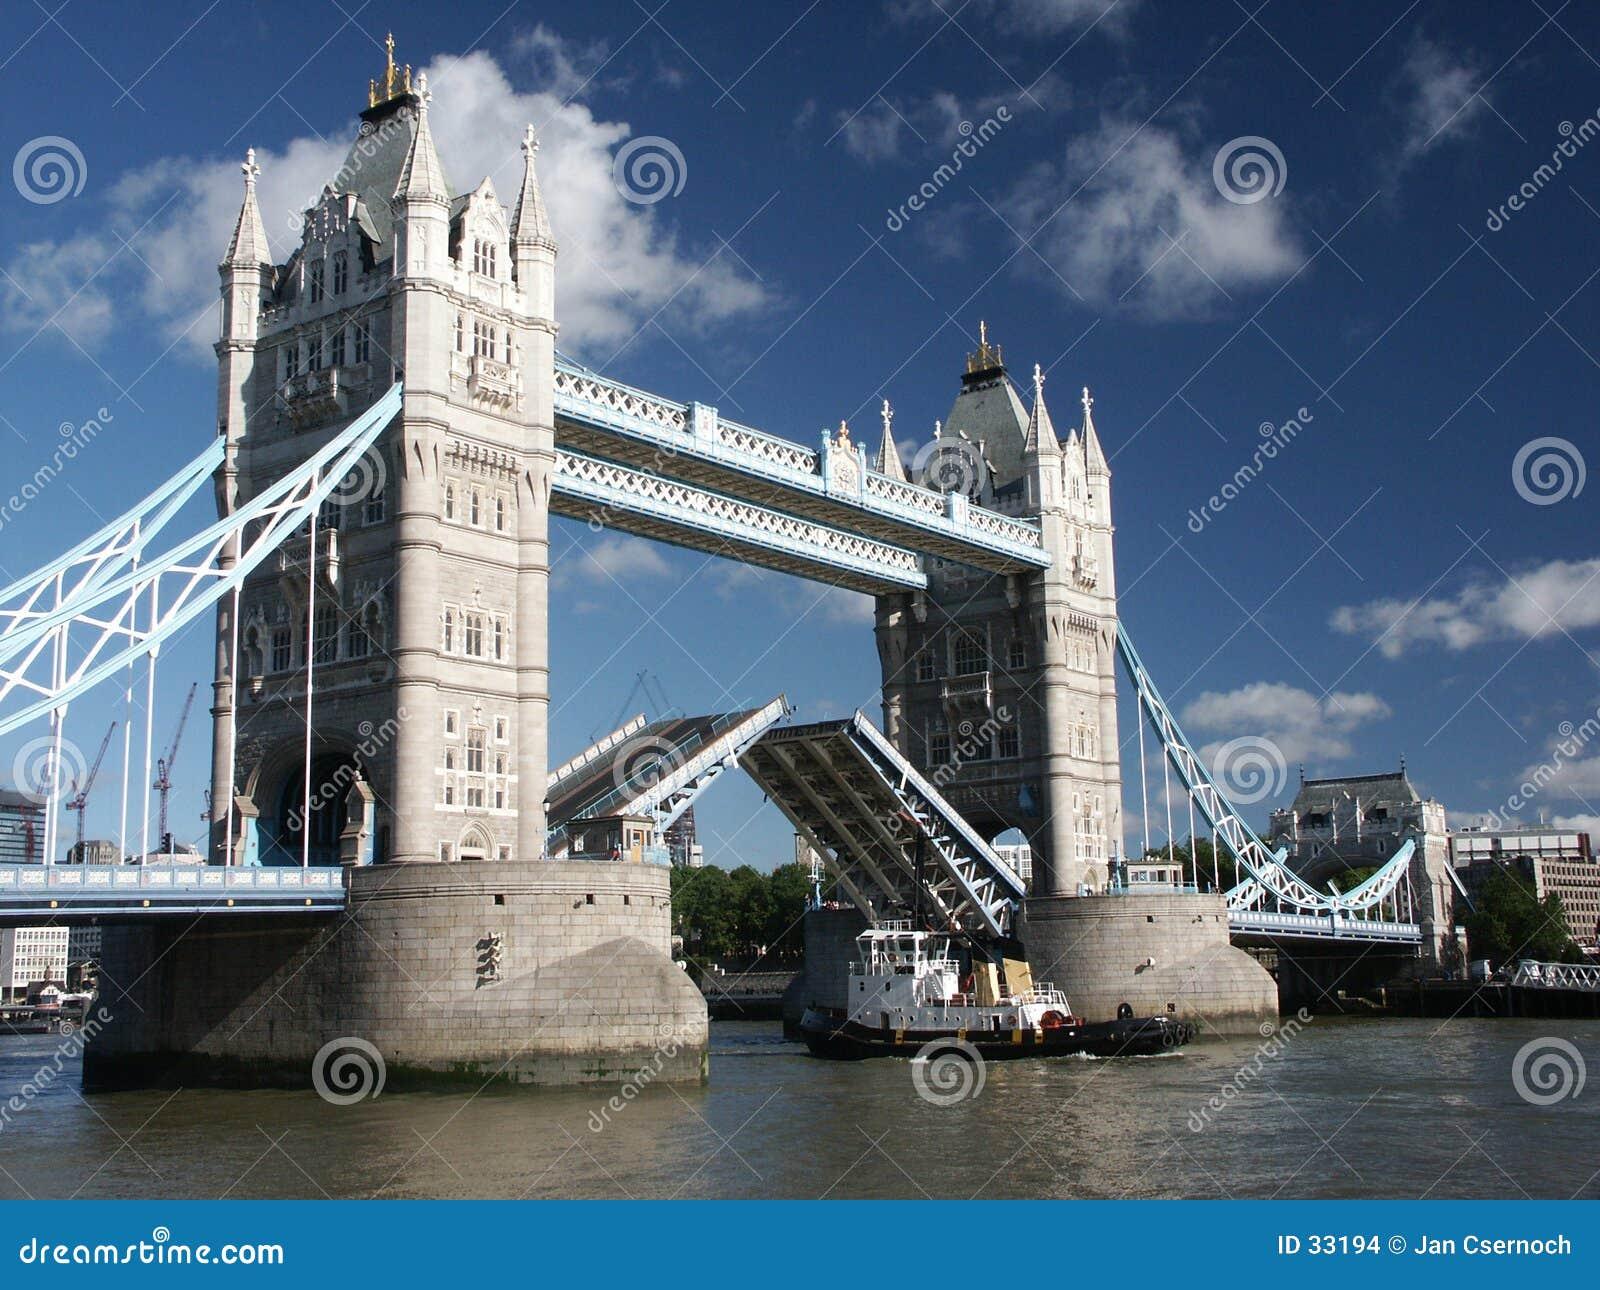 Tower Bridge with ship passing through